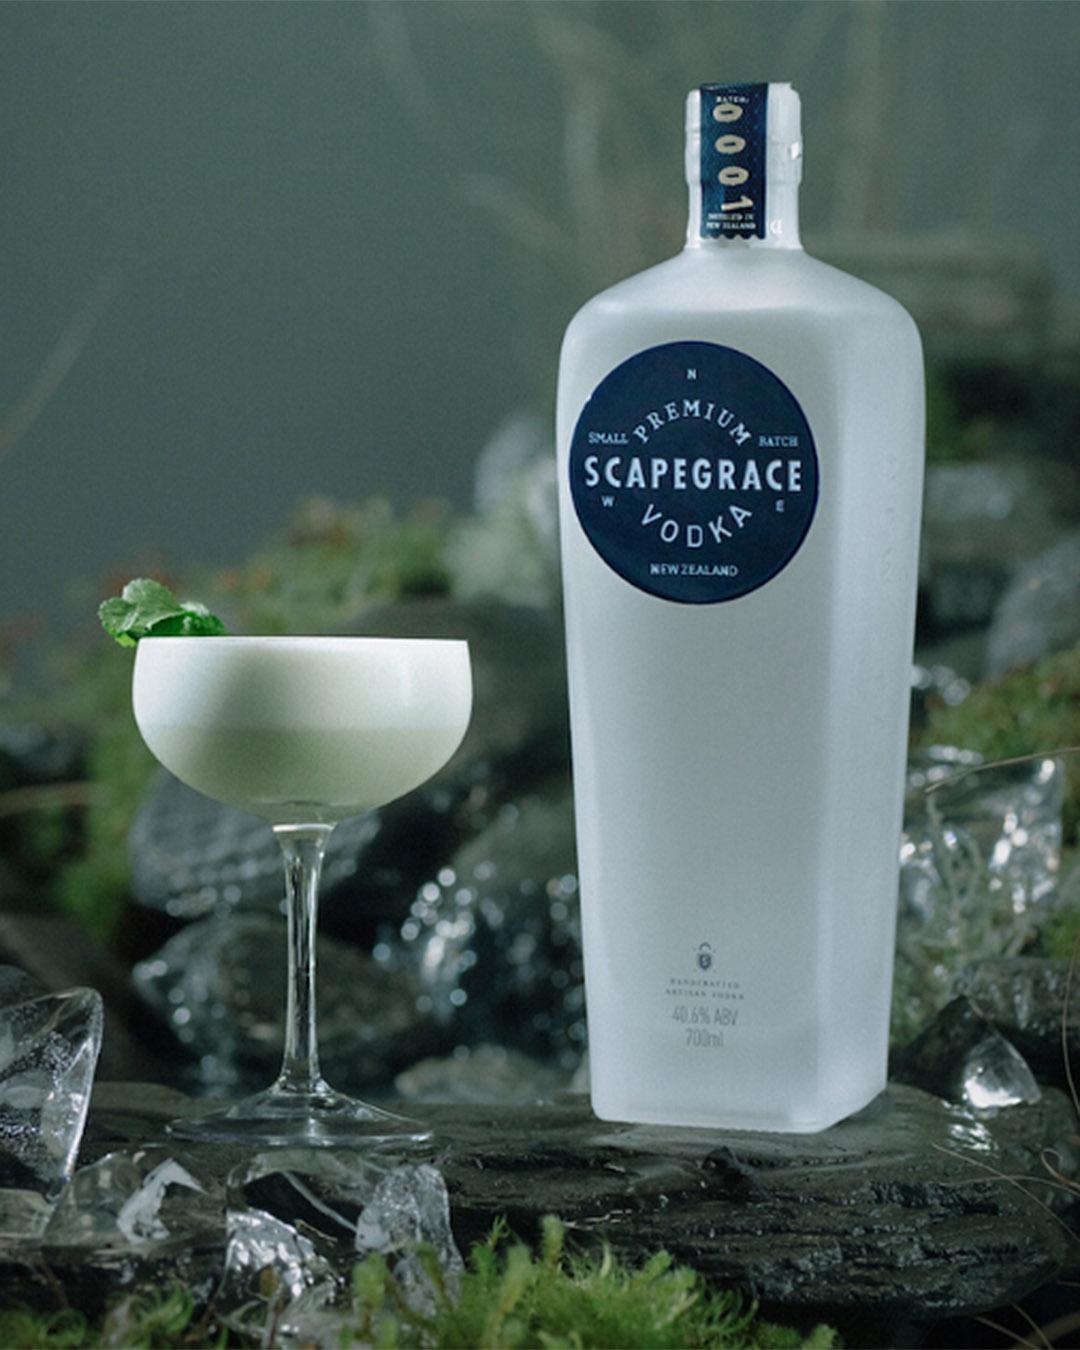 The Copra Coupe by Scapegrace vodka